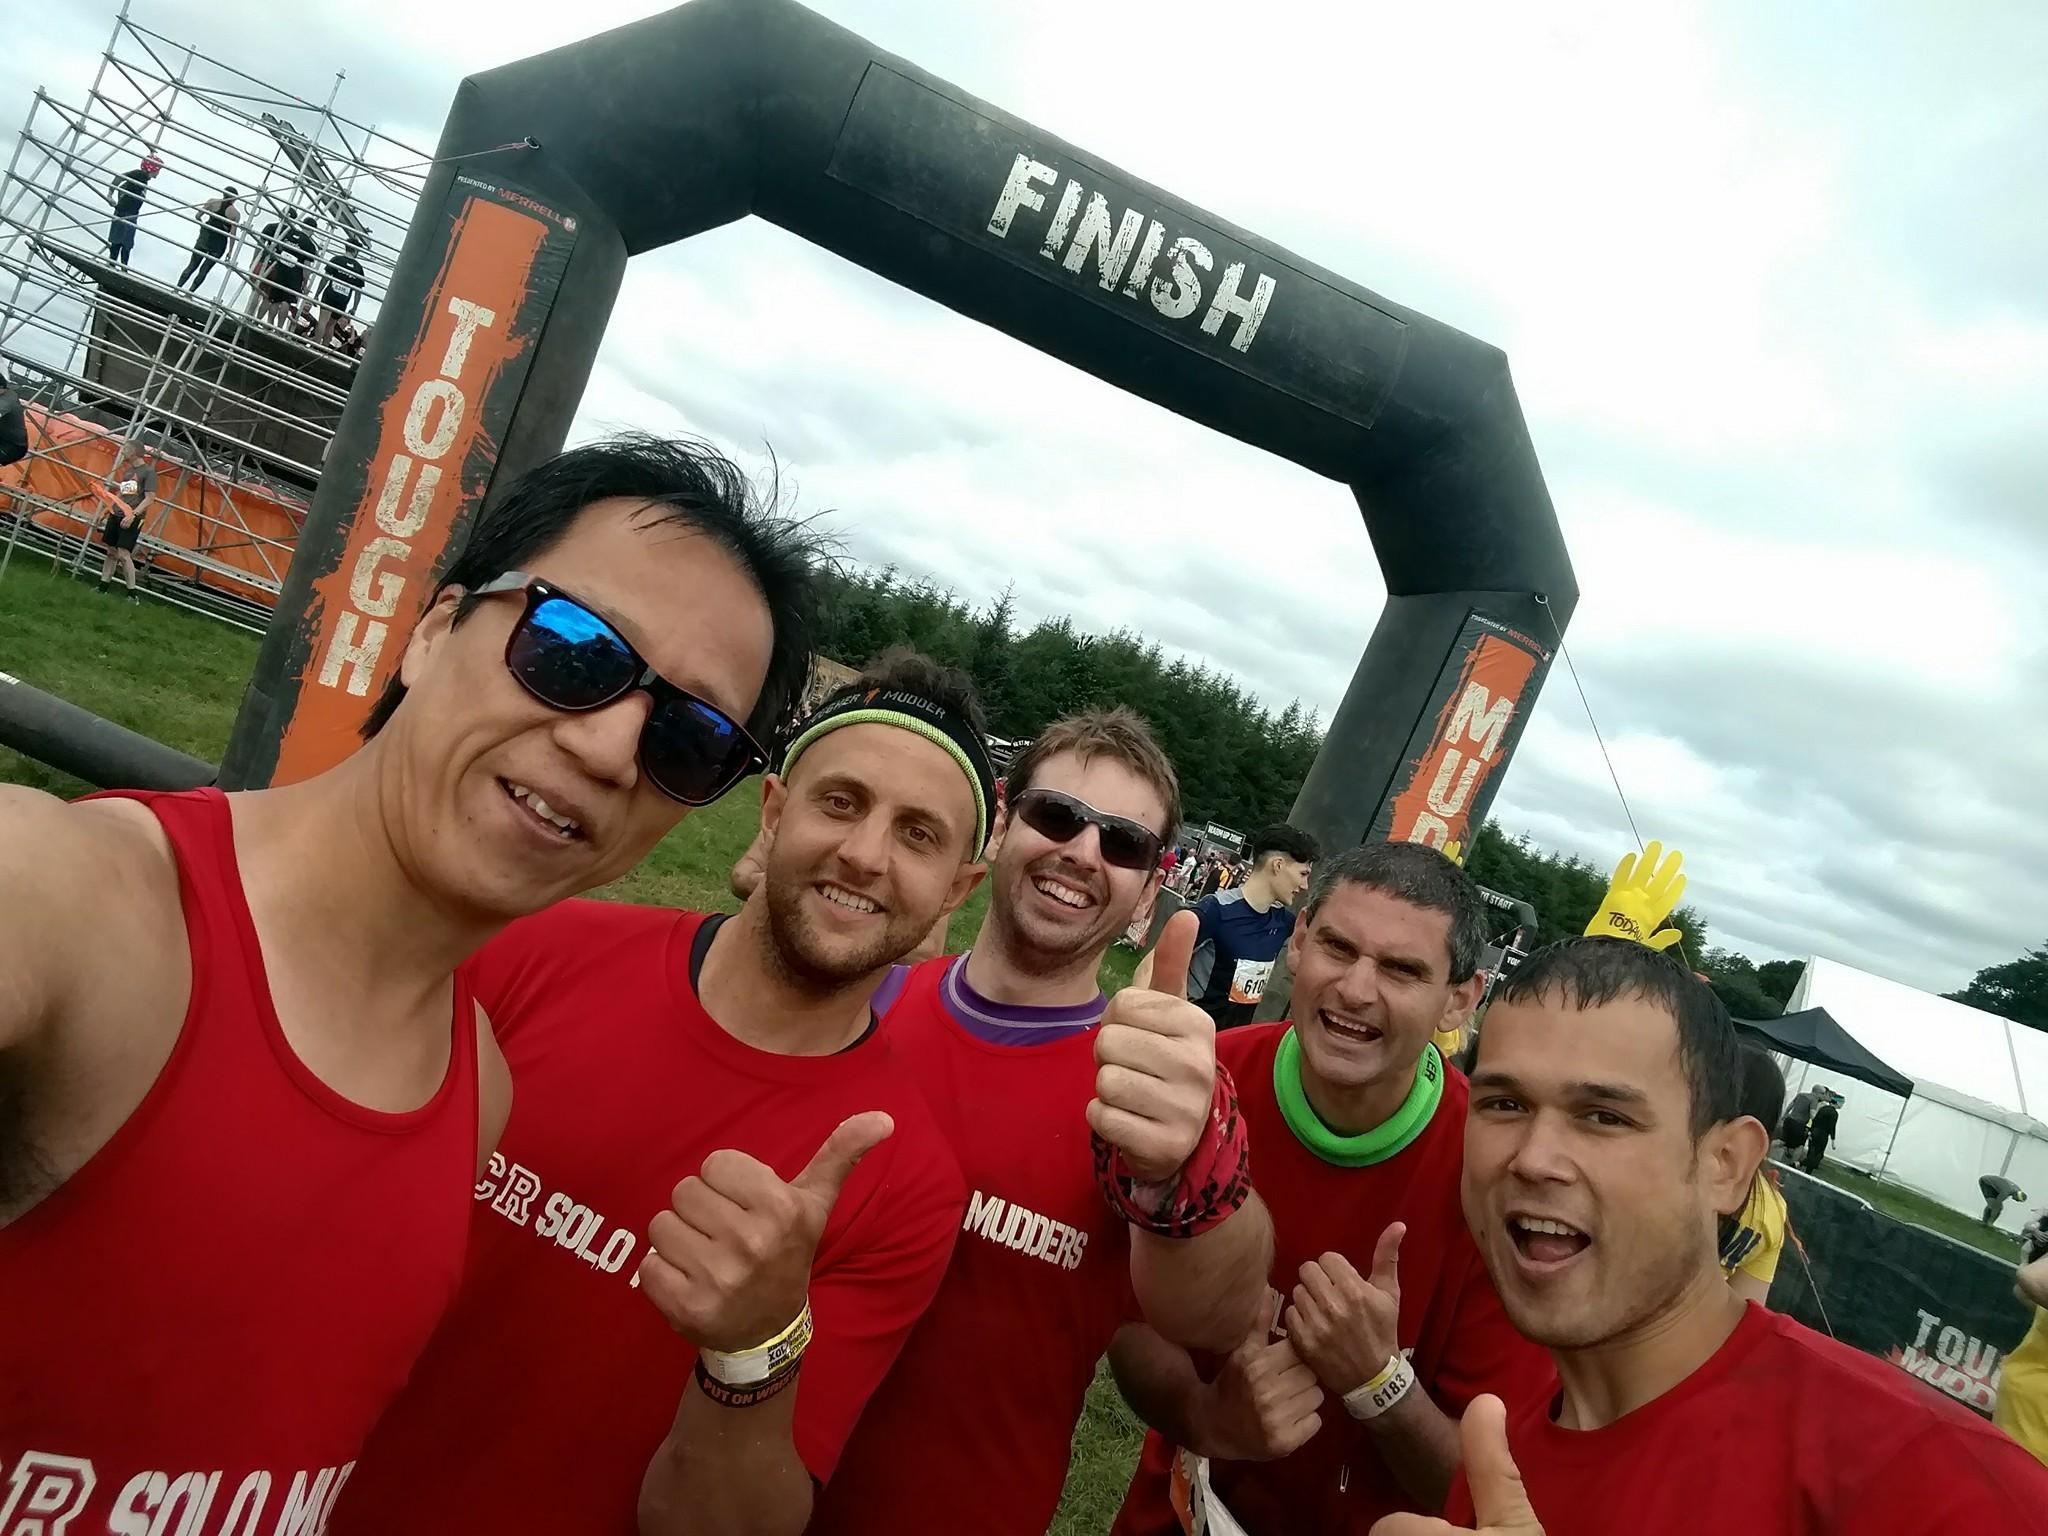 Tough Mudder Ireland 2017 Finish Line Selfie